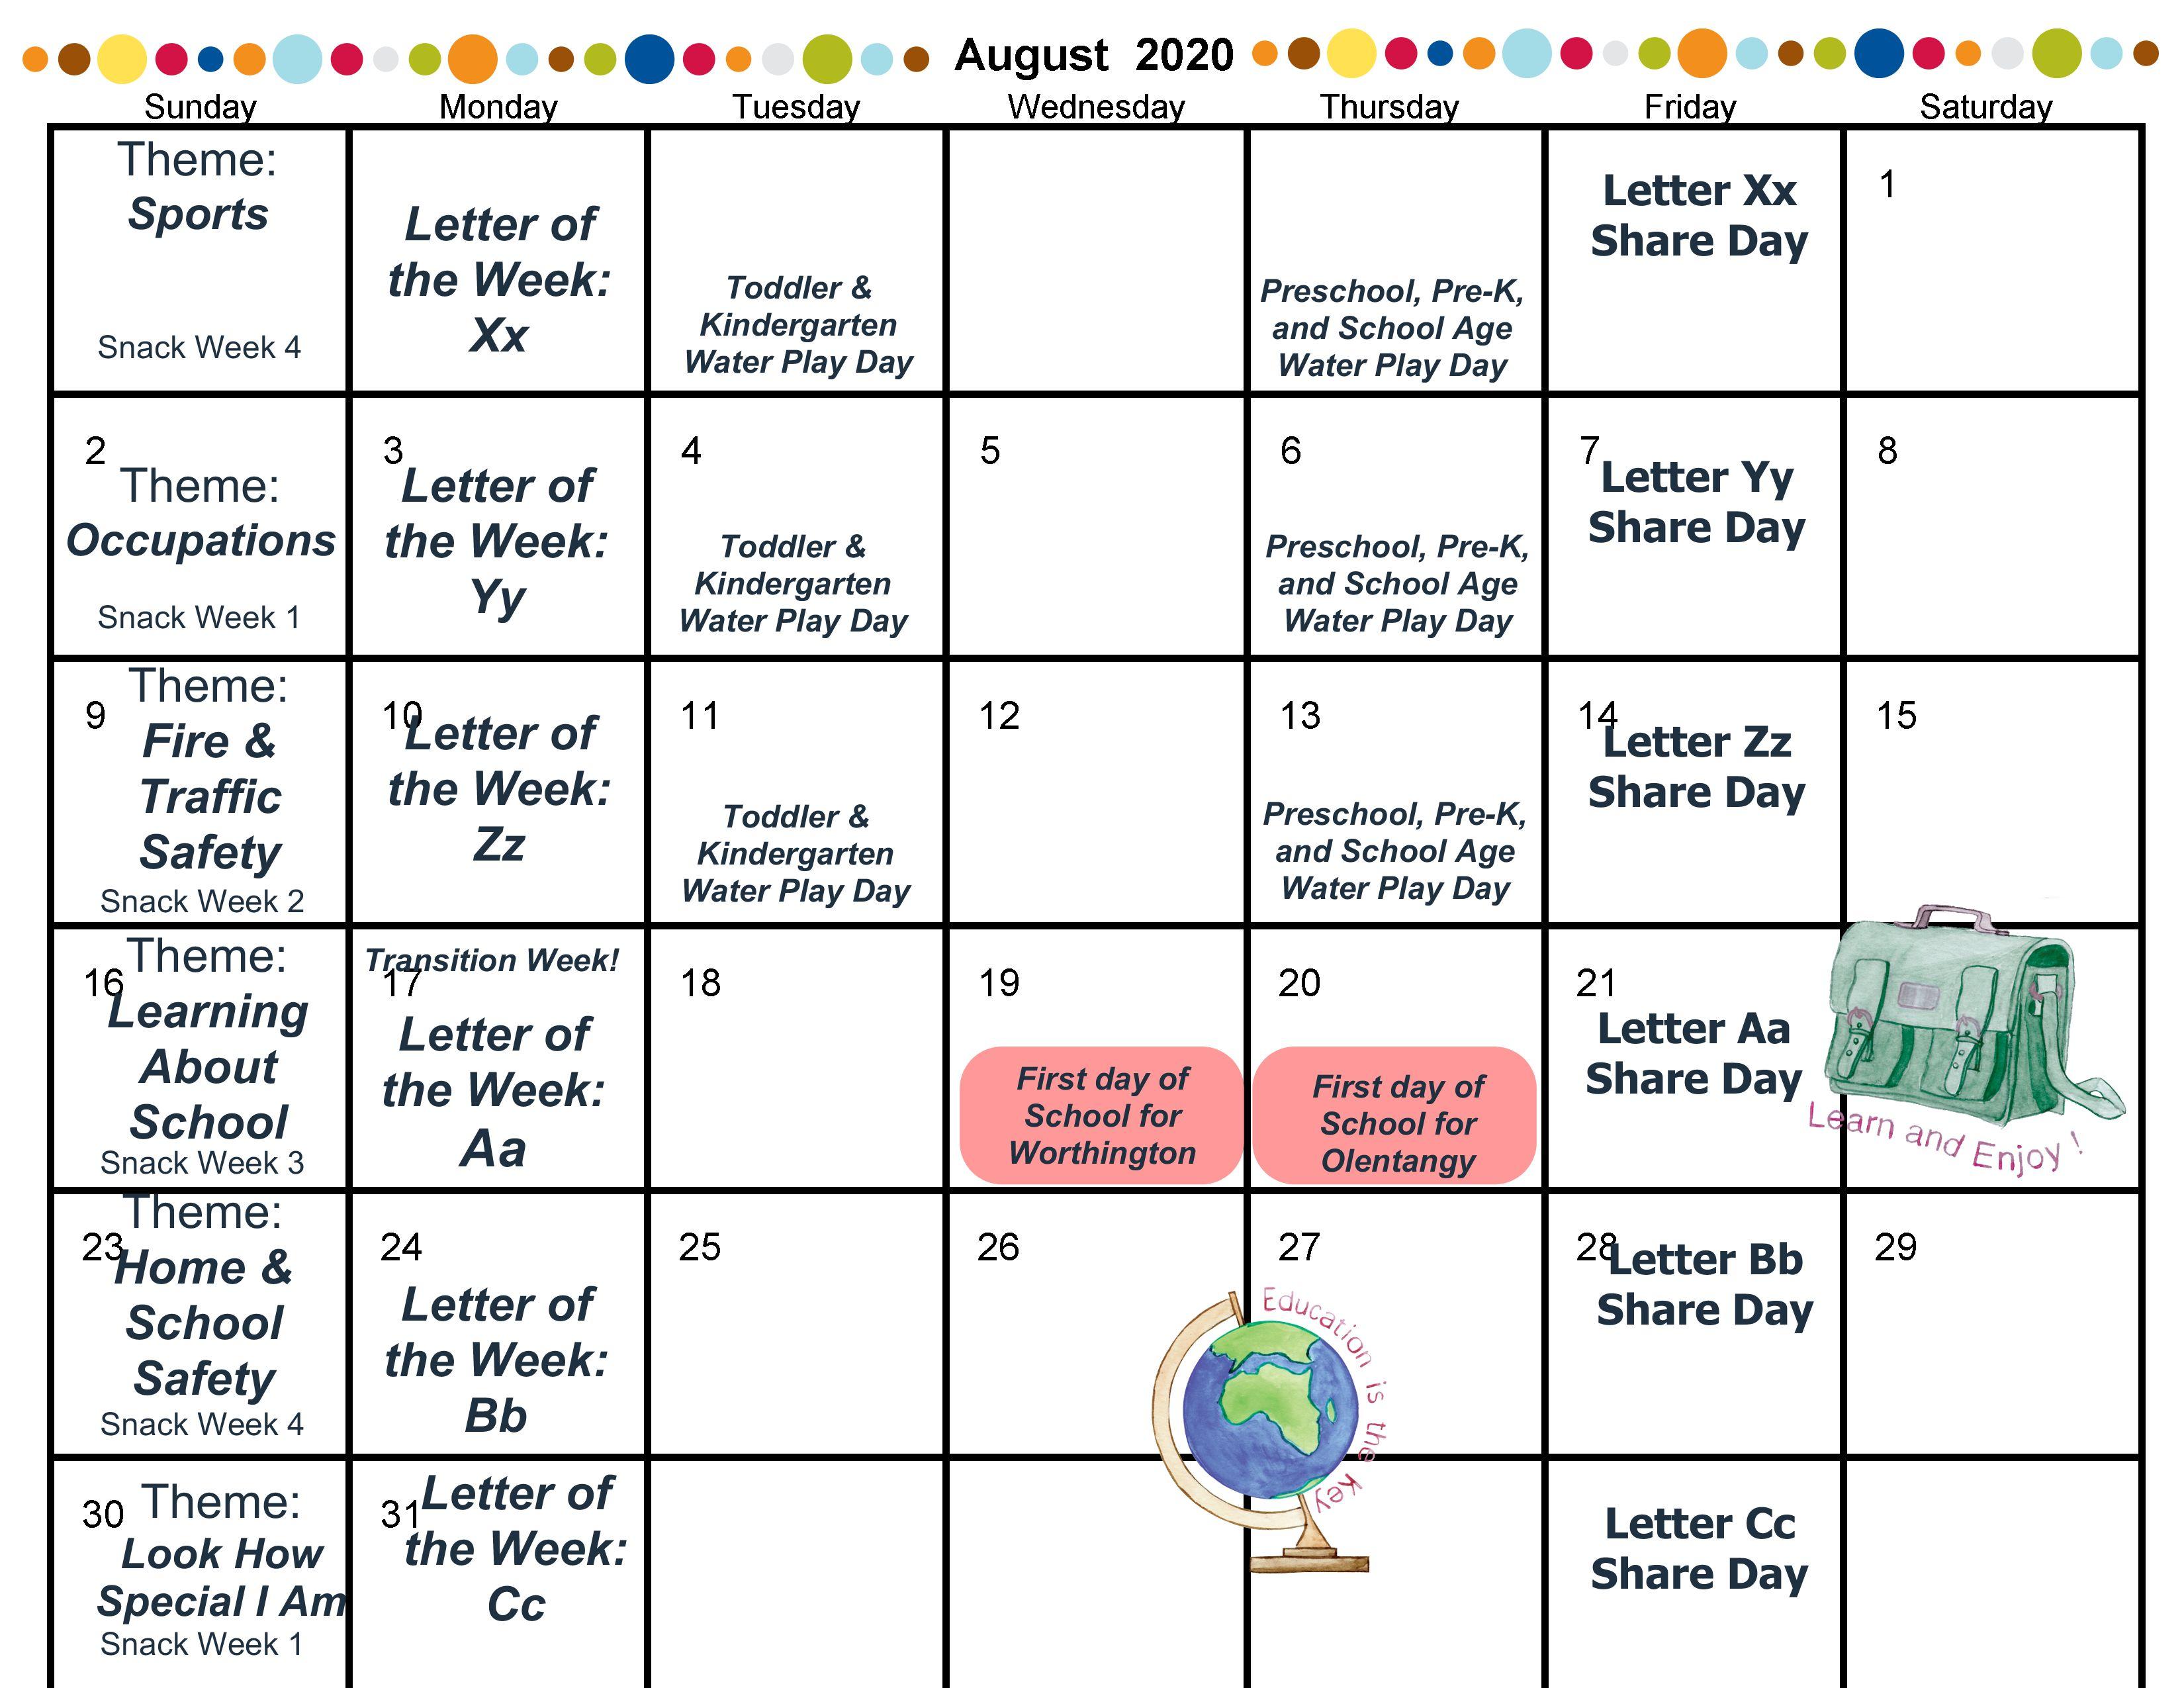 2020-8 BH August Calendar-001.jpg